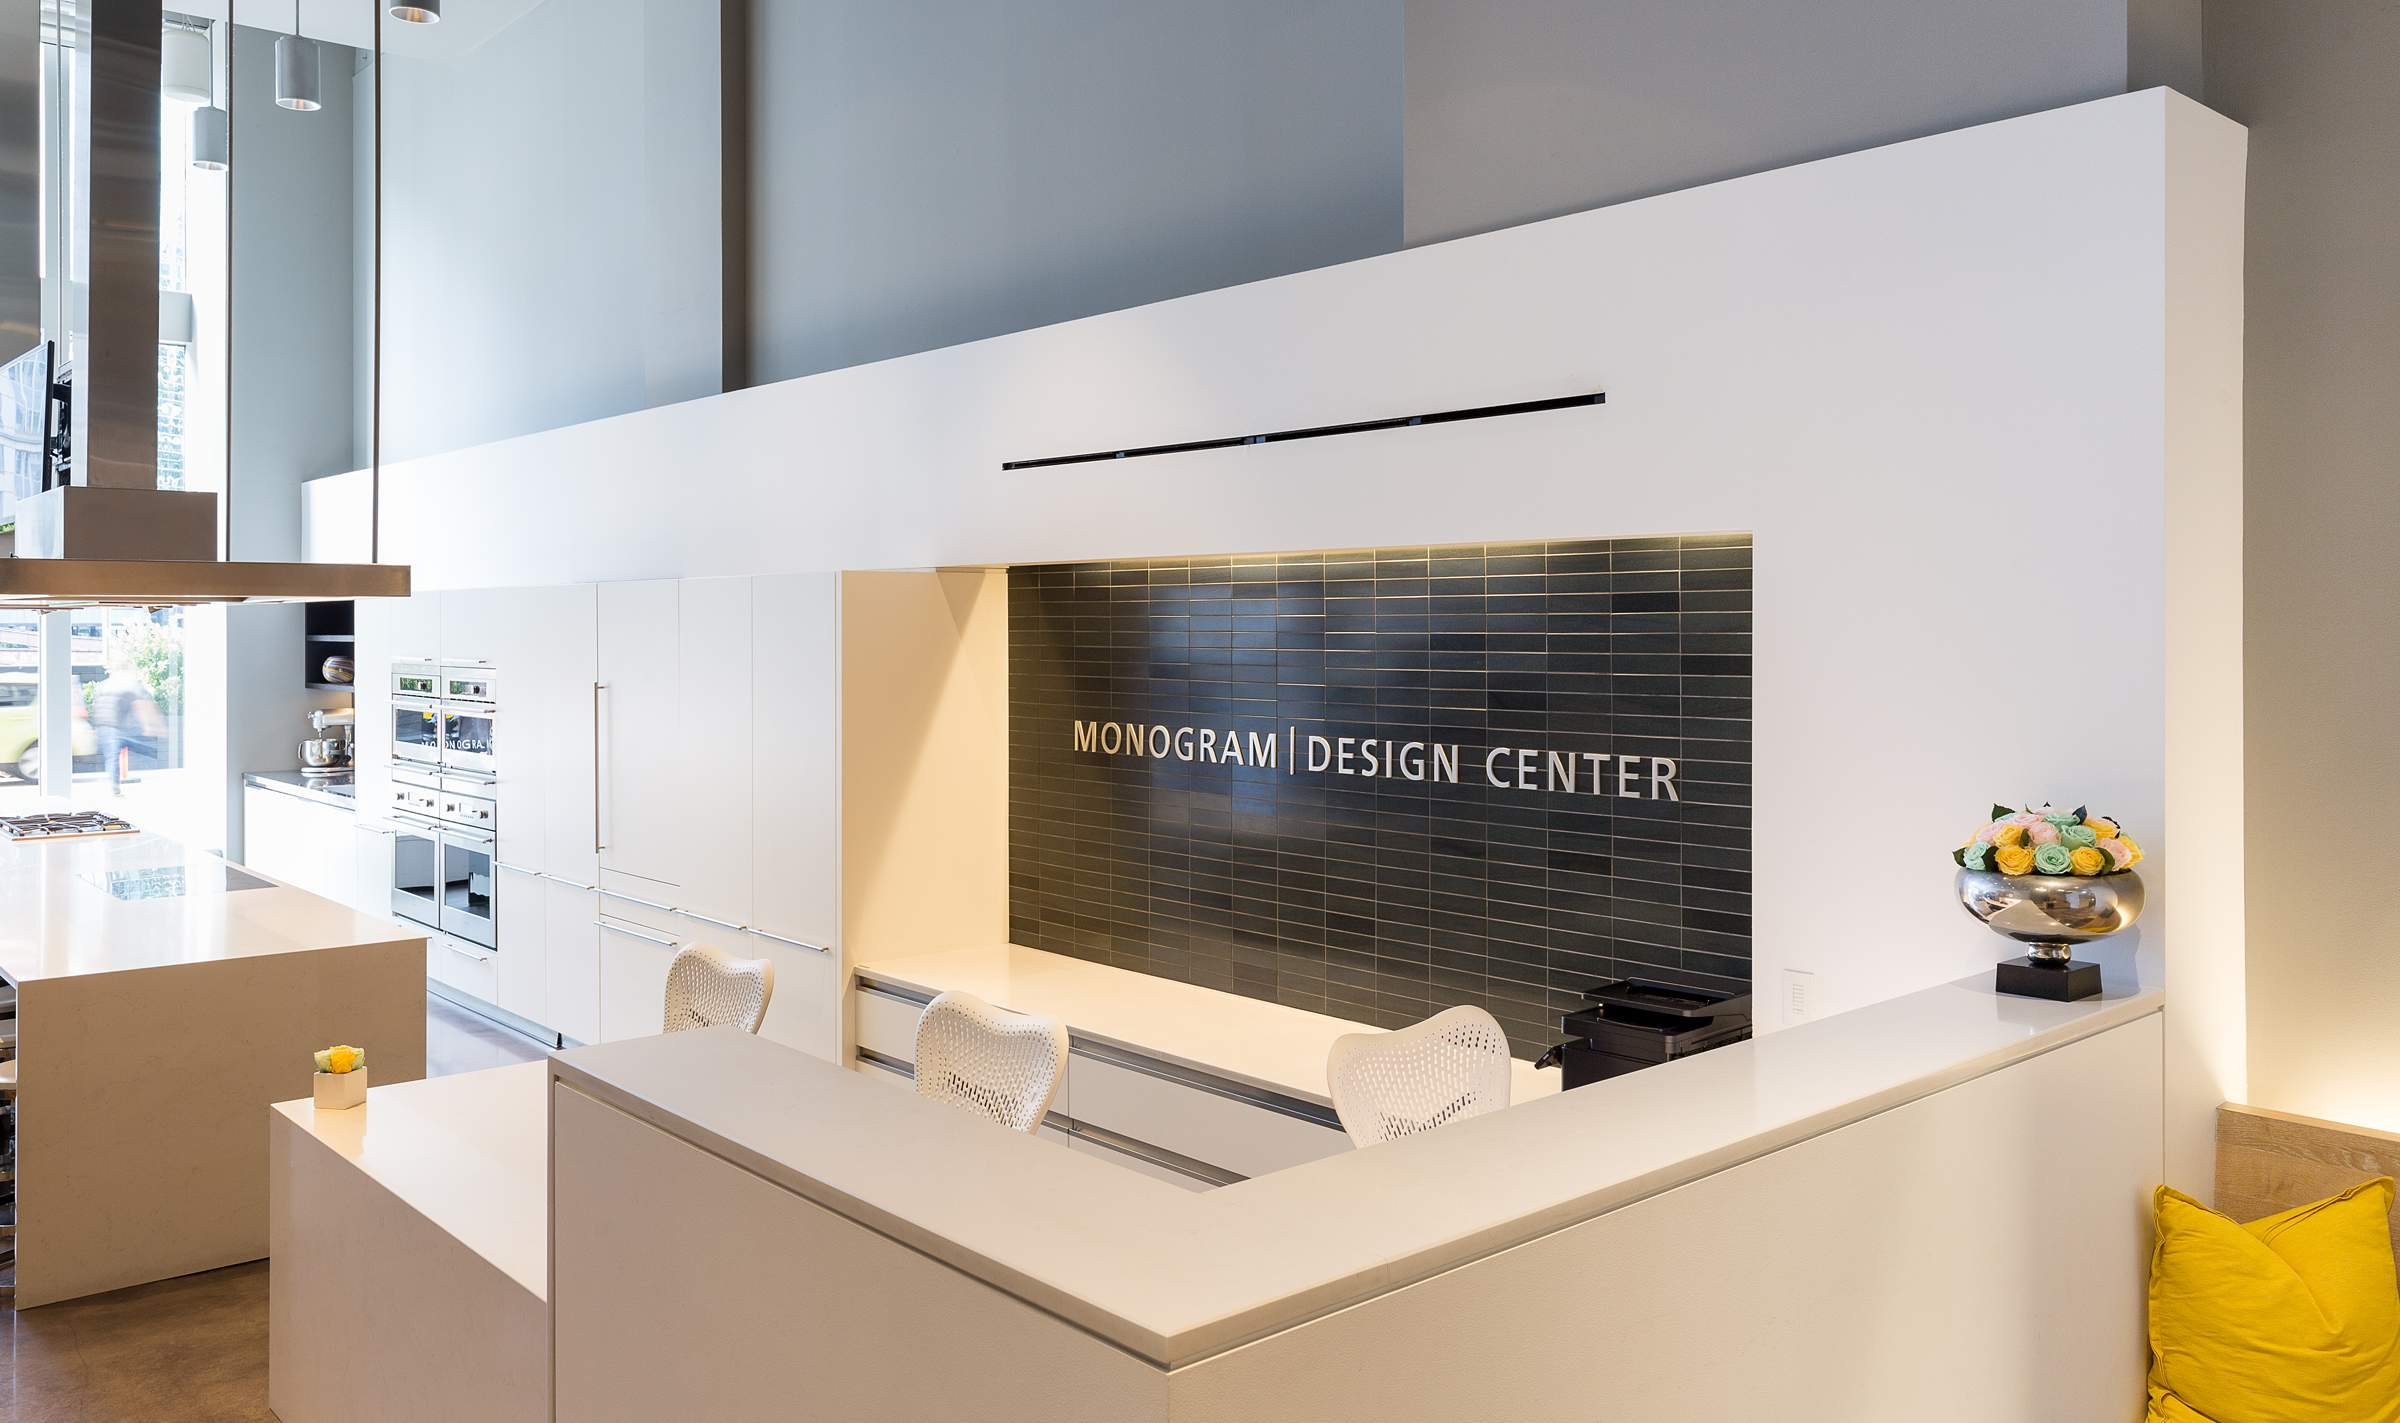 Incredible Monogram Design Center Showroom Interior Architectural Download Free Architecture Designs Scobabritishbridgeorg